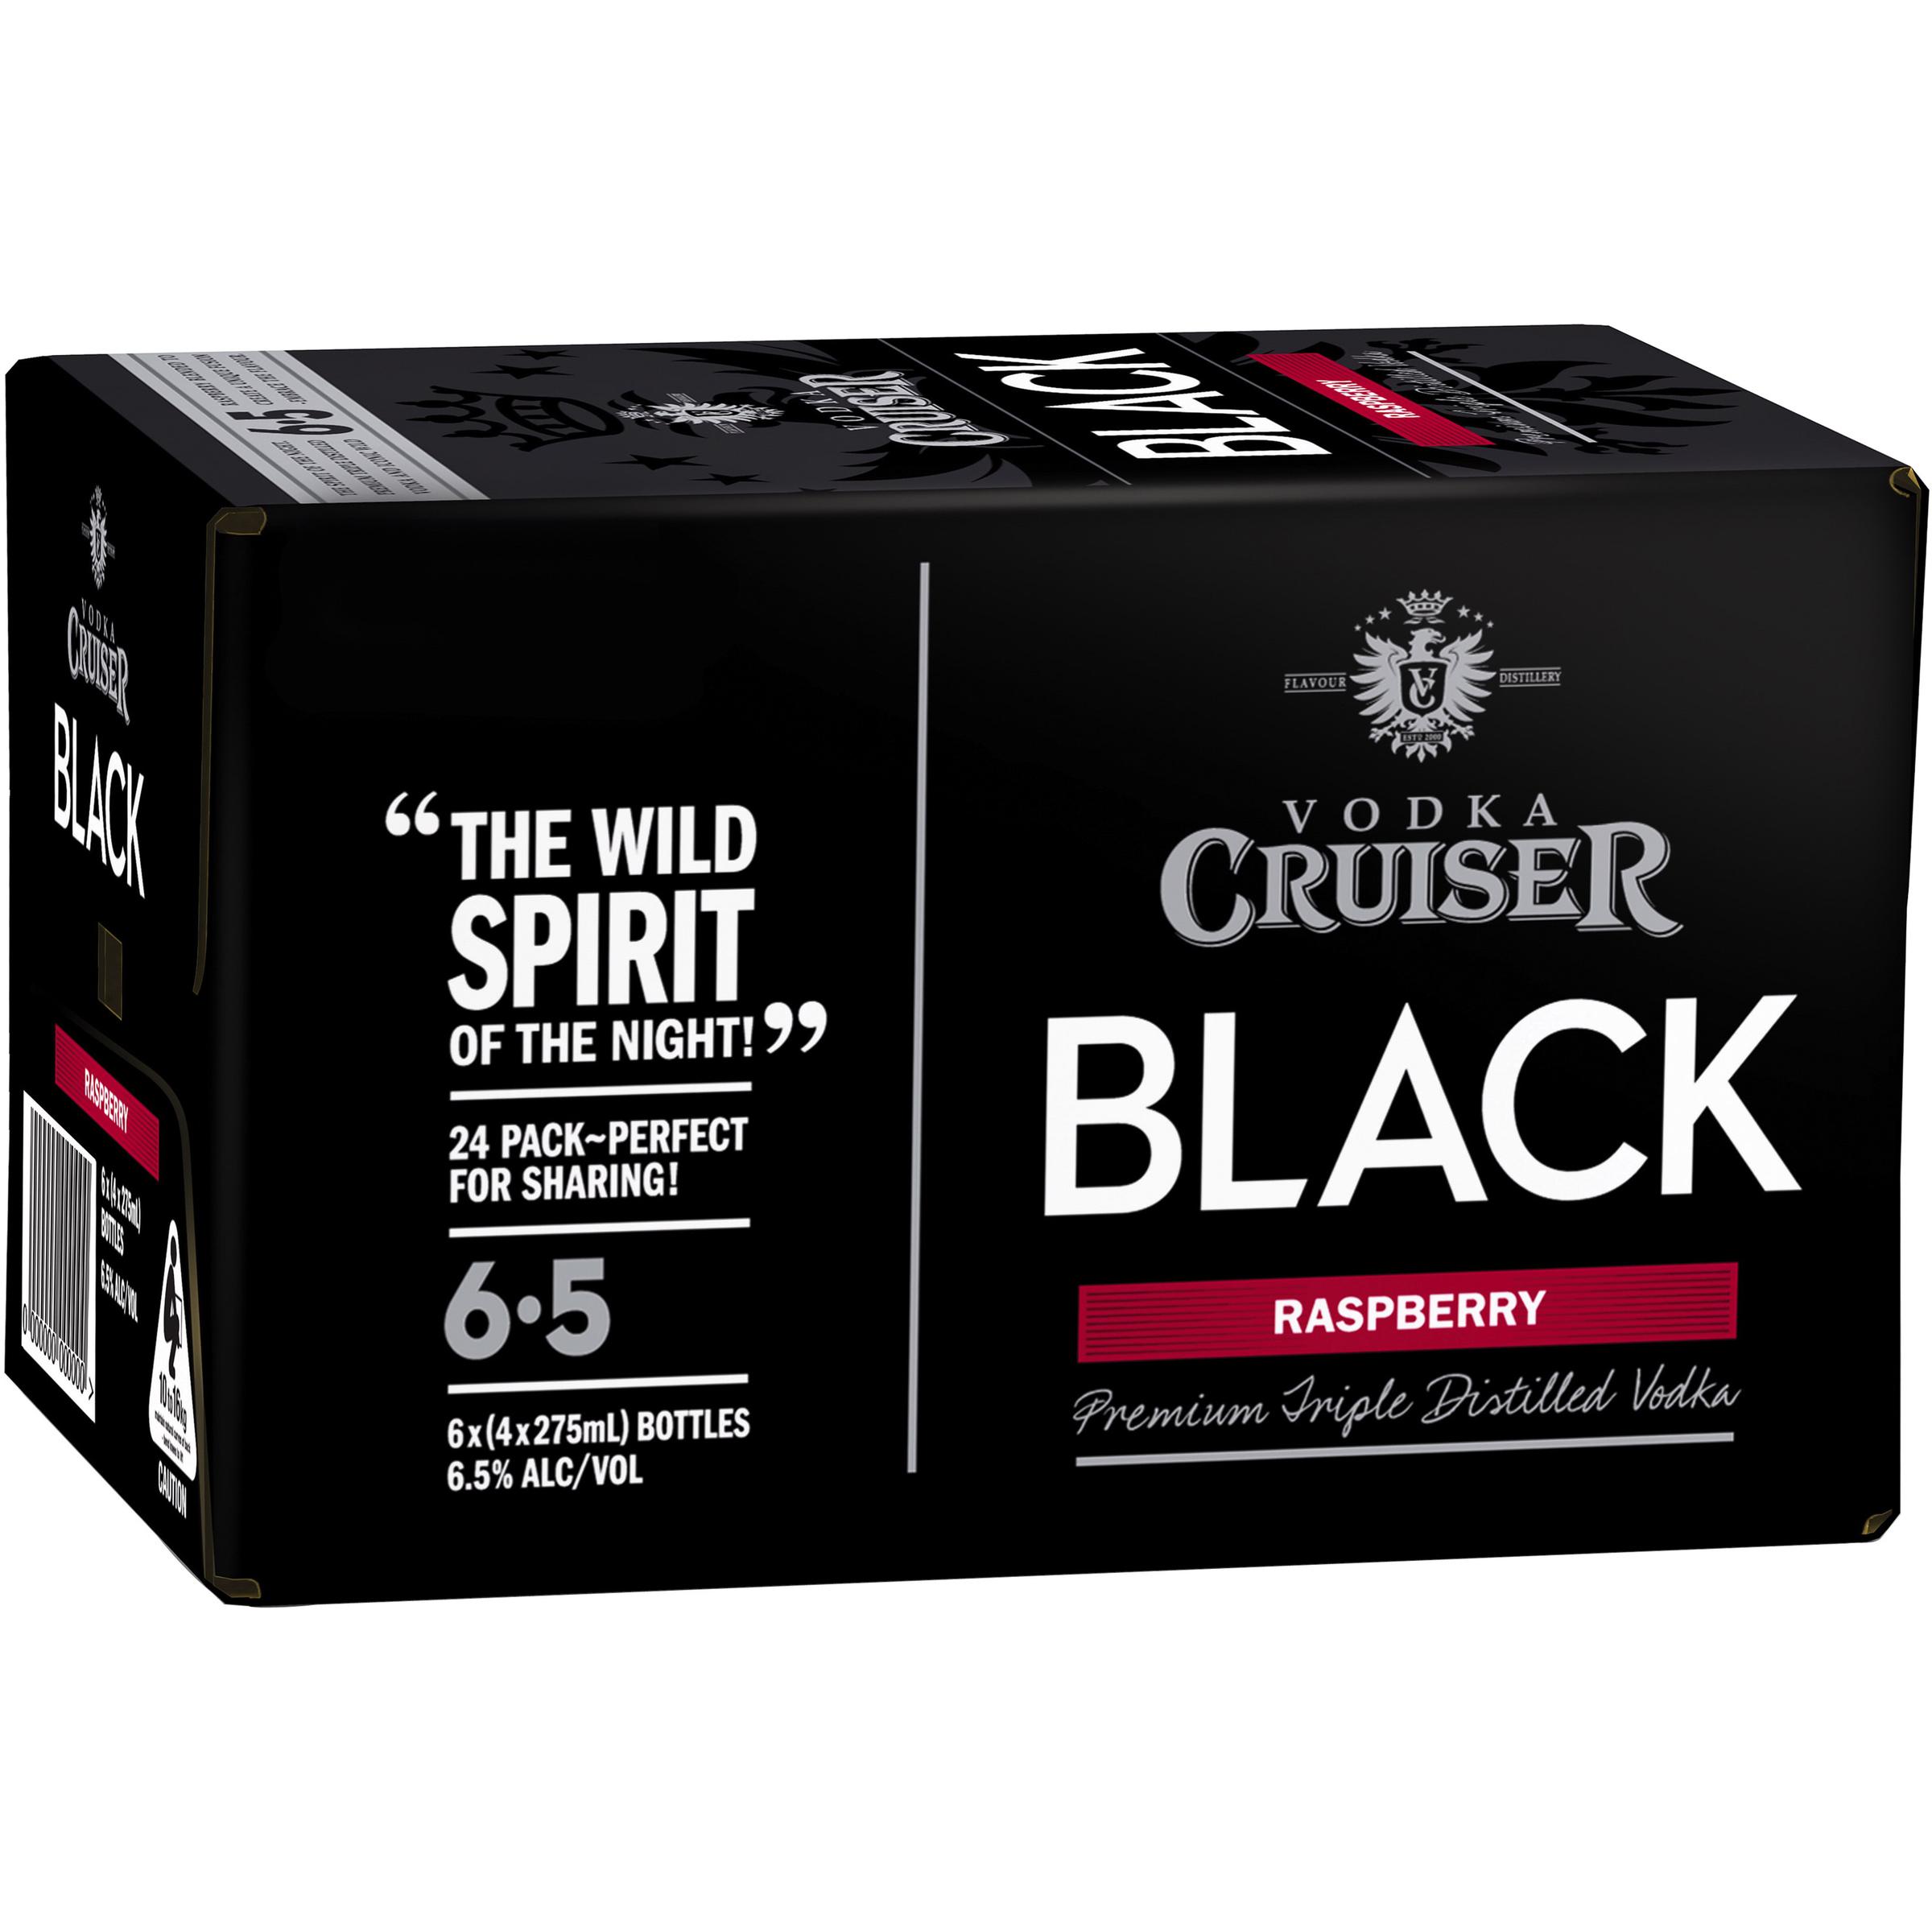 VODKA CRUISER BLACK RASPBERRY